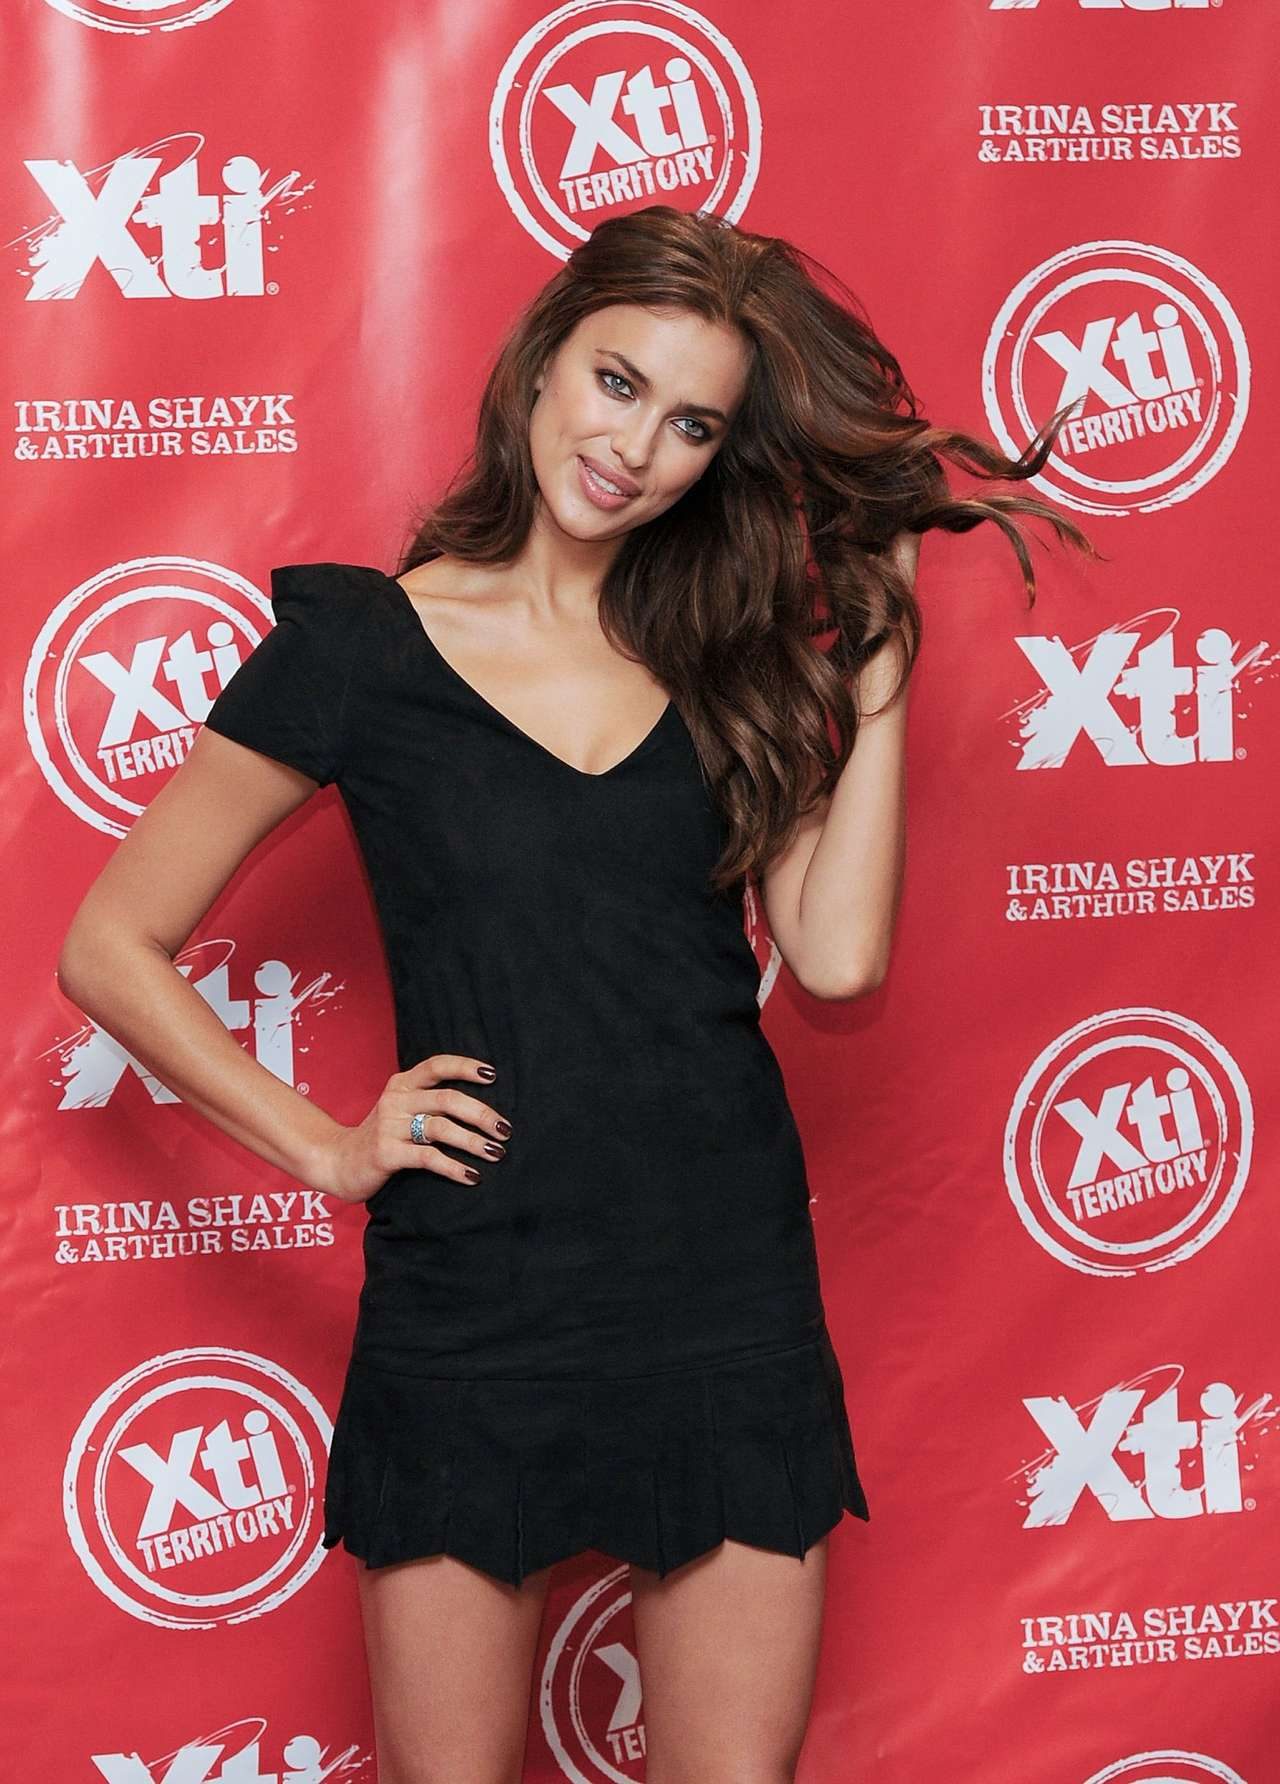 Irina Shayk Xti Footwear Irina Shayk Xti Shoes 03